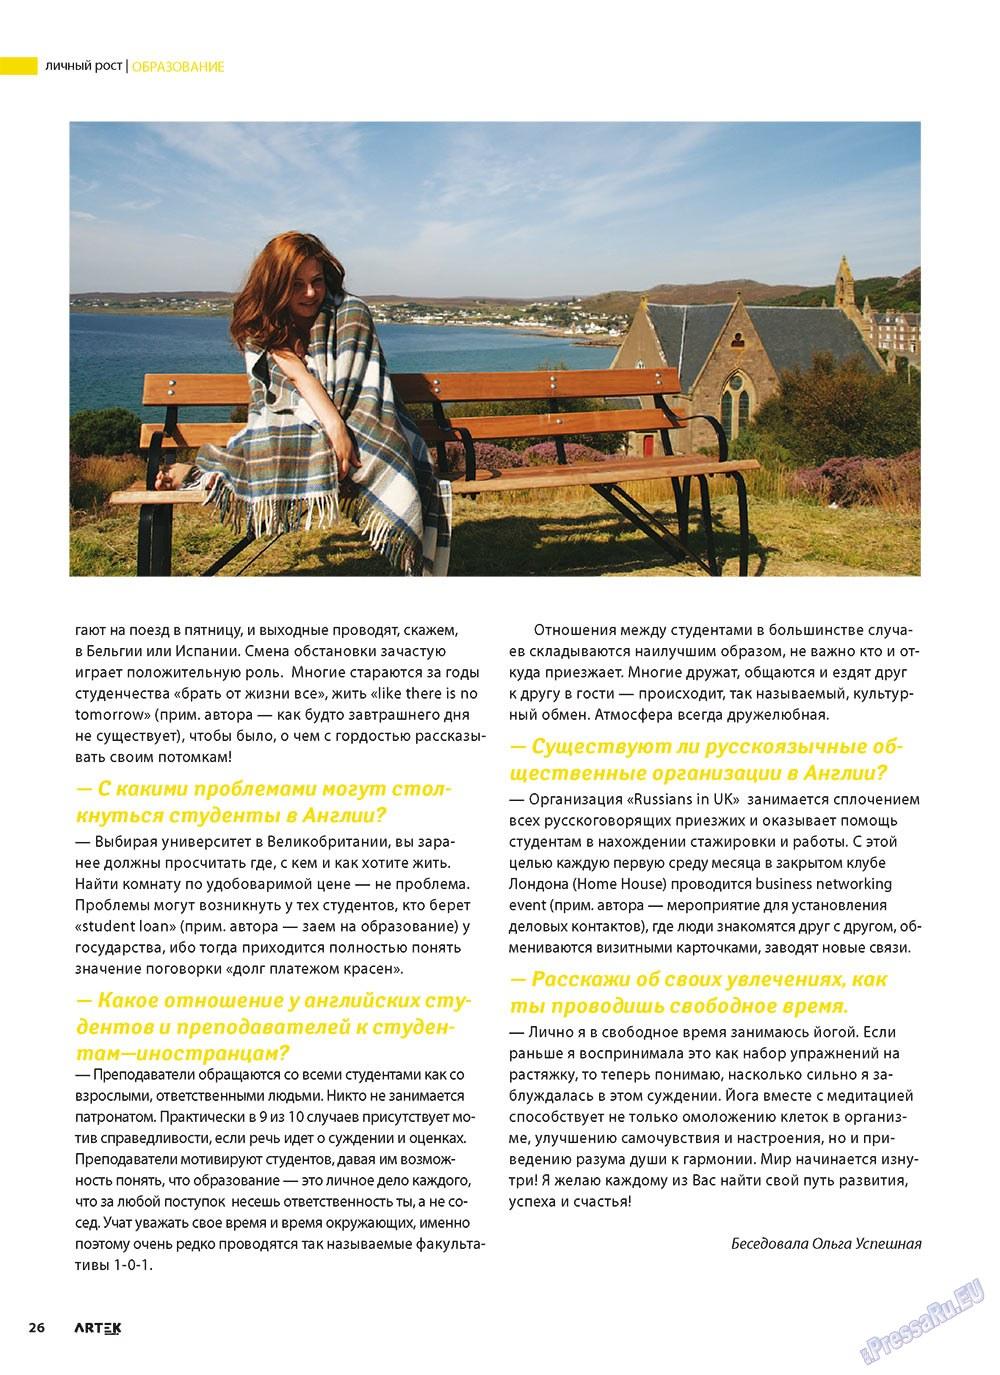 Артек (журнал). 2011 год, номер 1, стр. 28